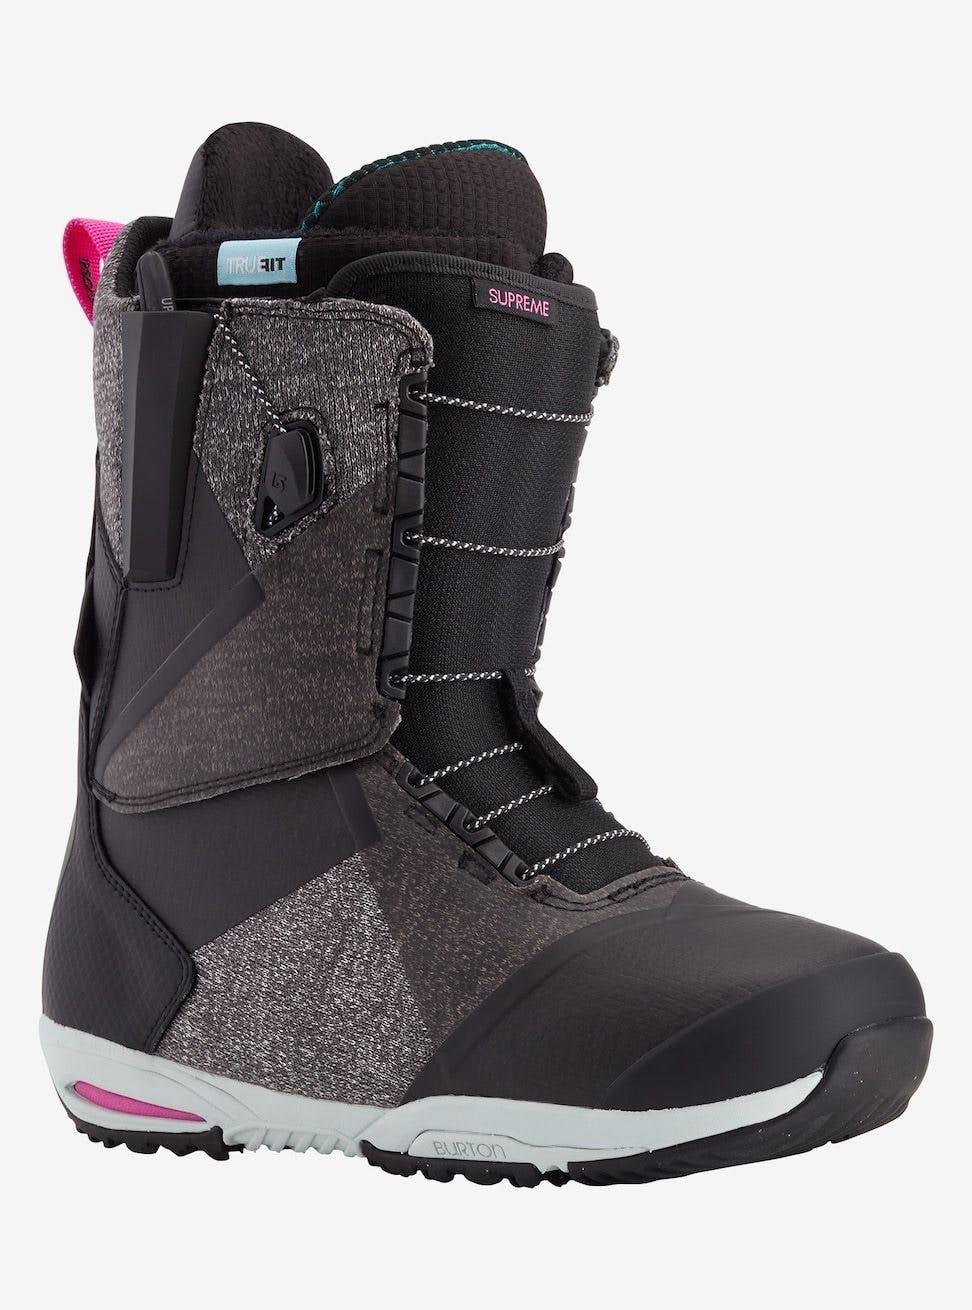 Burton Supreme Snowboard Boots · 2021